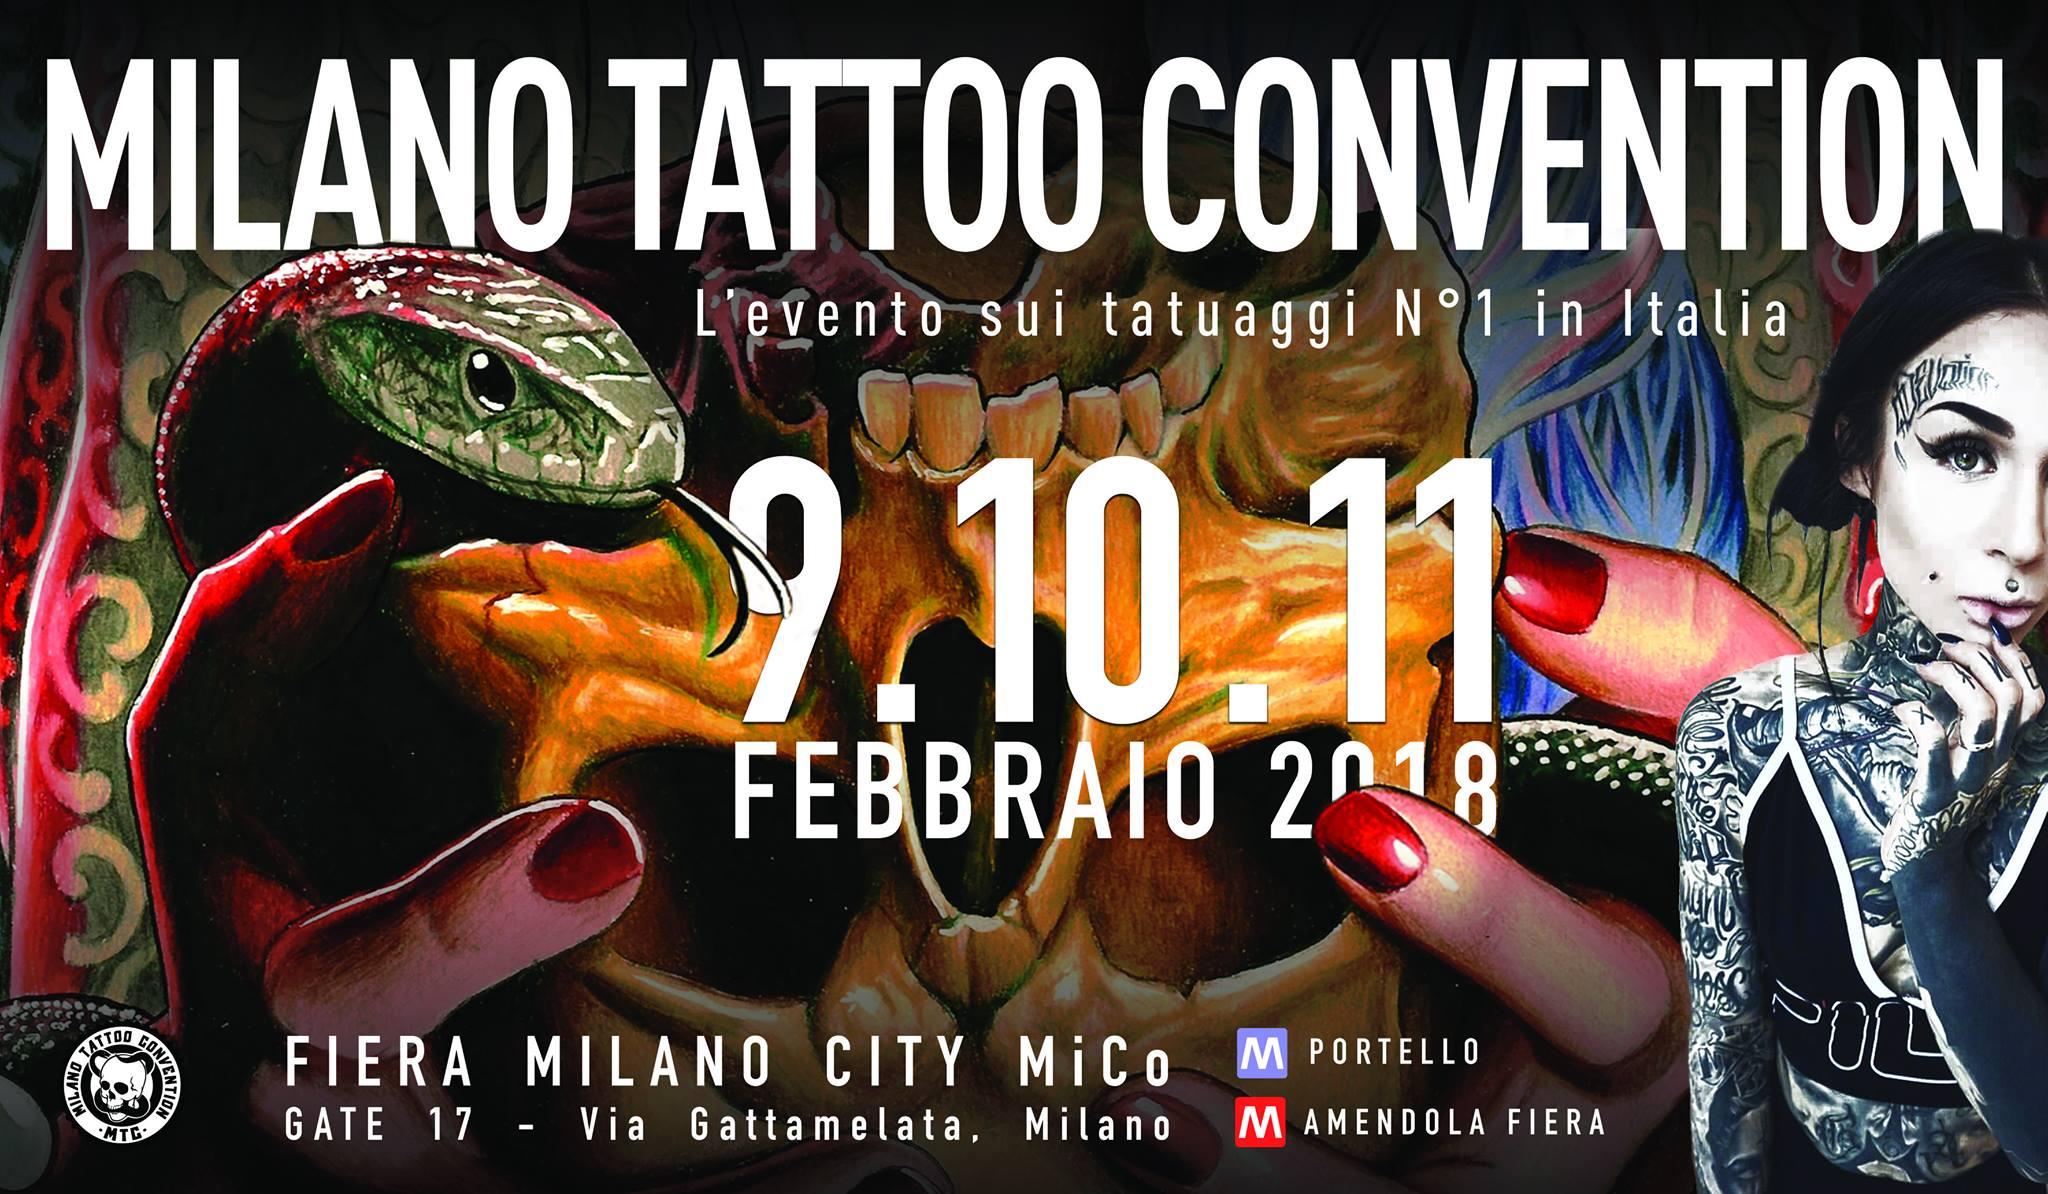 Milano Tattoo Convention 2018: 9-10-11 Febbraio